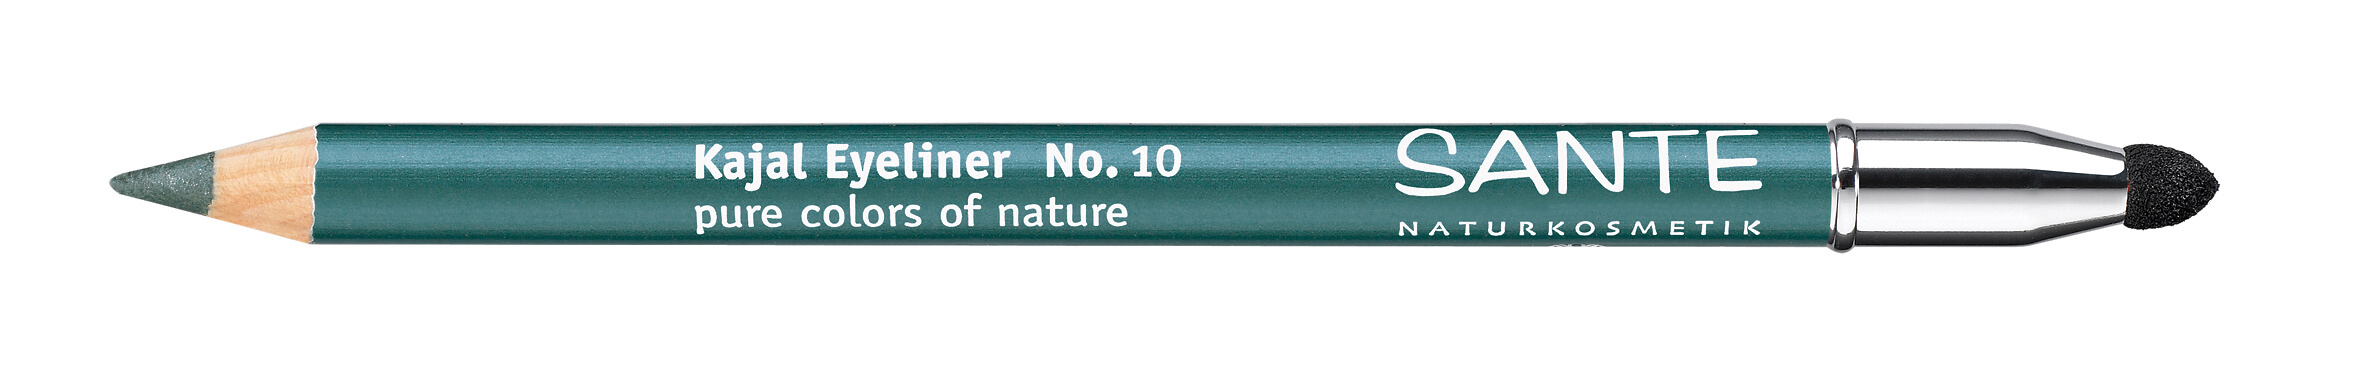 Silmapliiats Petrol 10 Sante, 1 tk